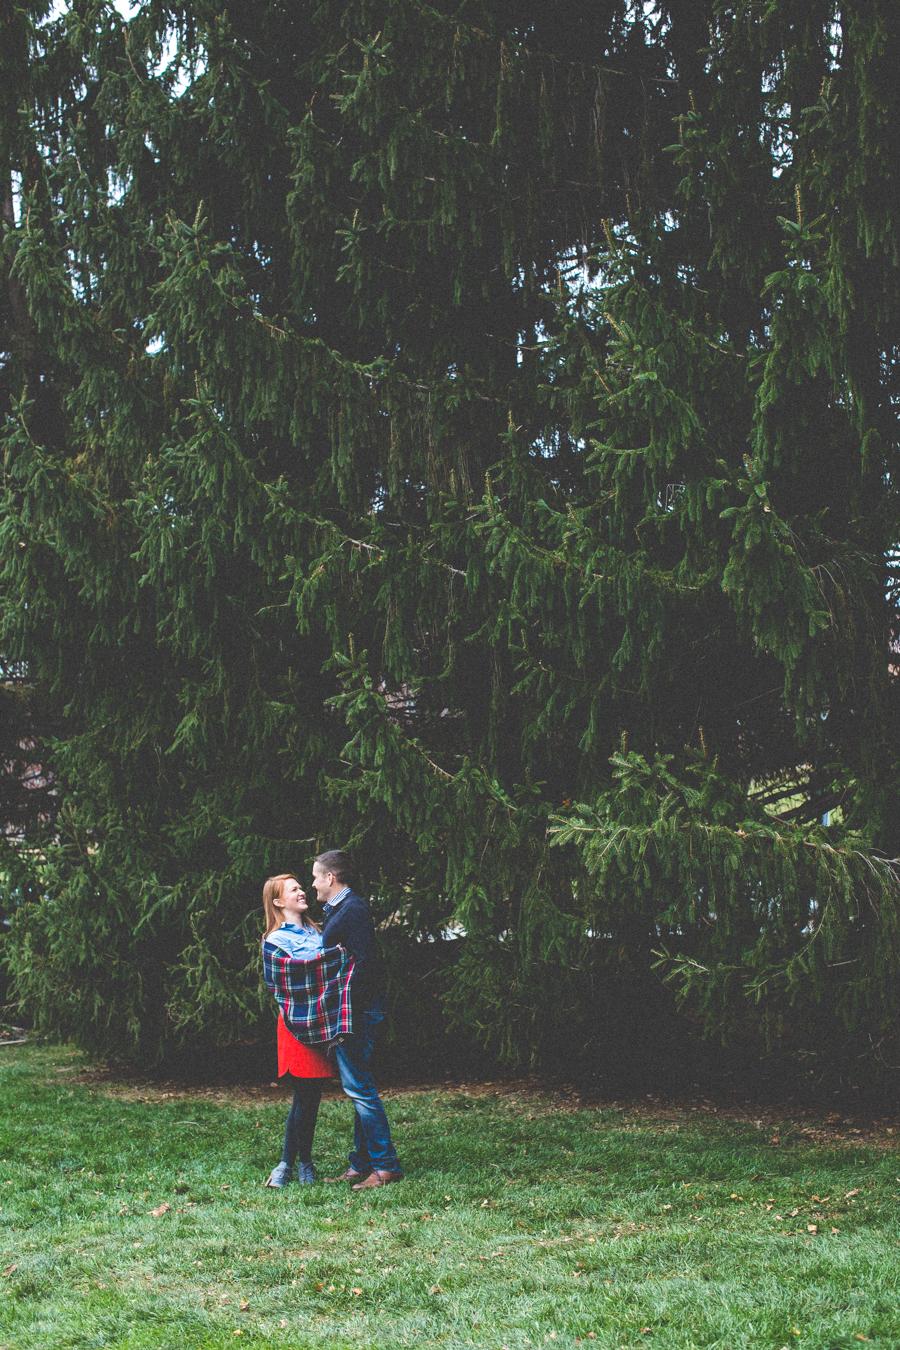 Lailee-Michael-Engagement-Blog-1-41.jpg